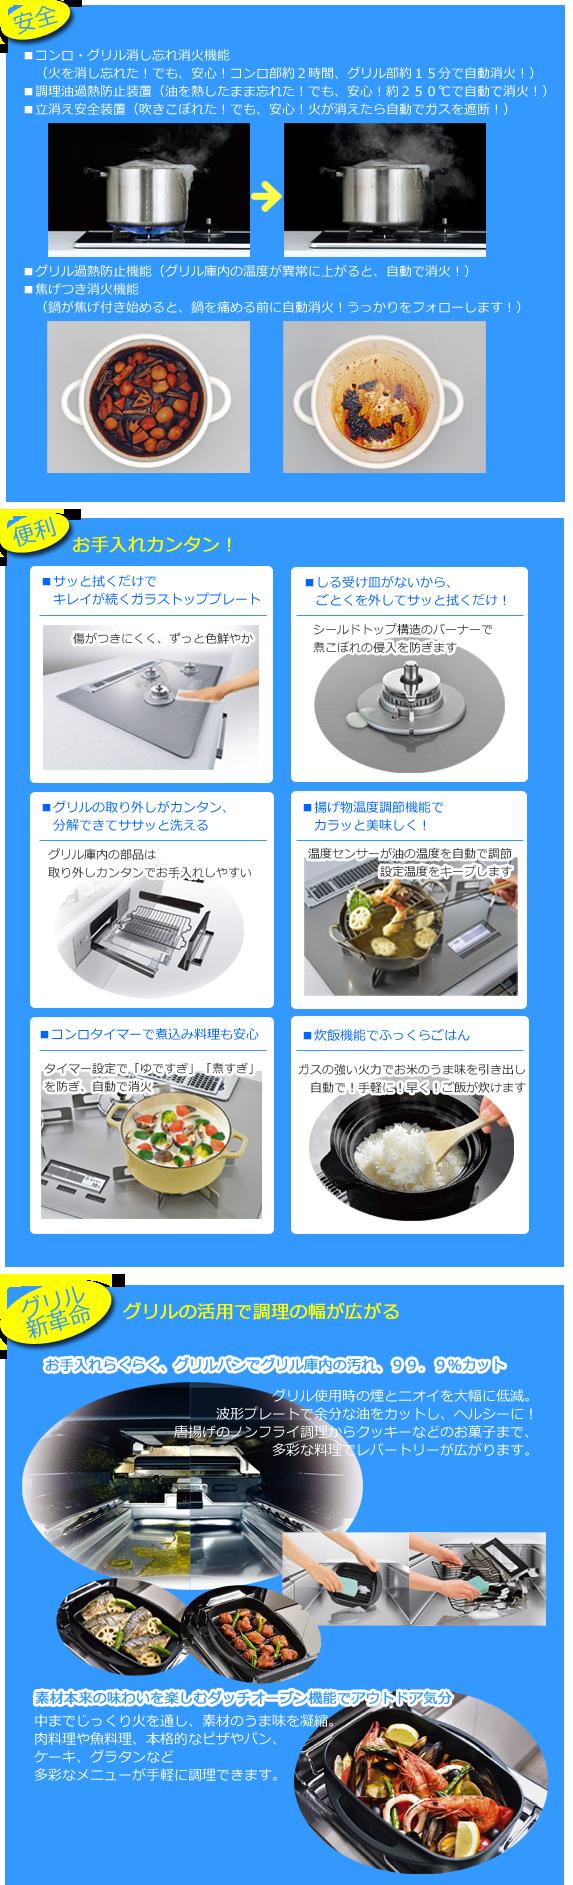 stove001.png